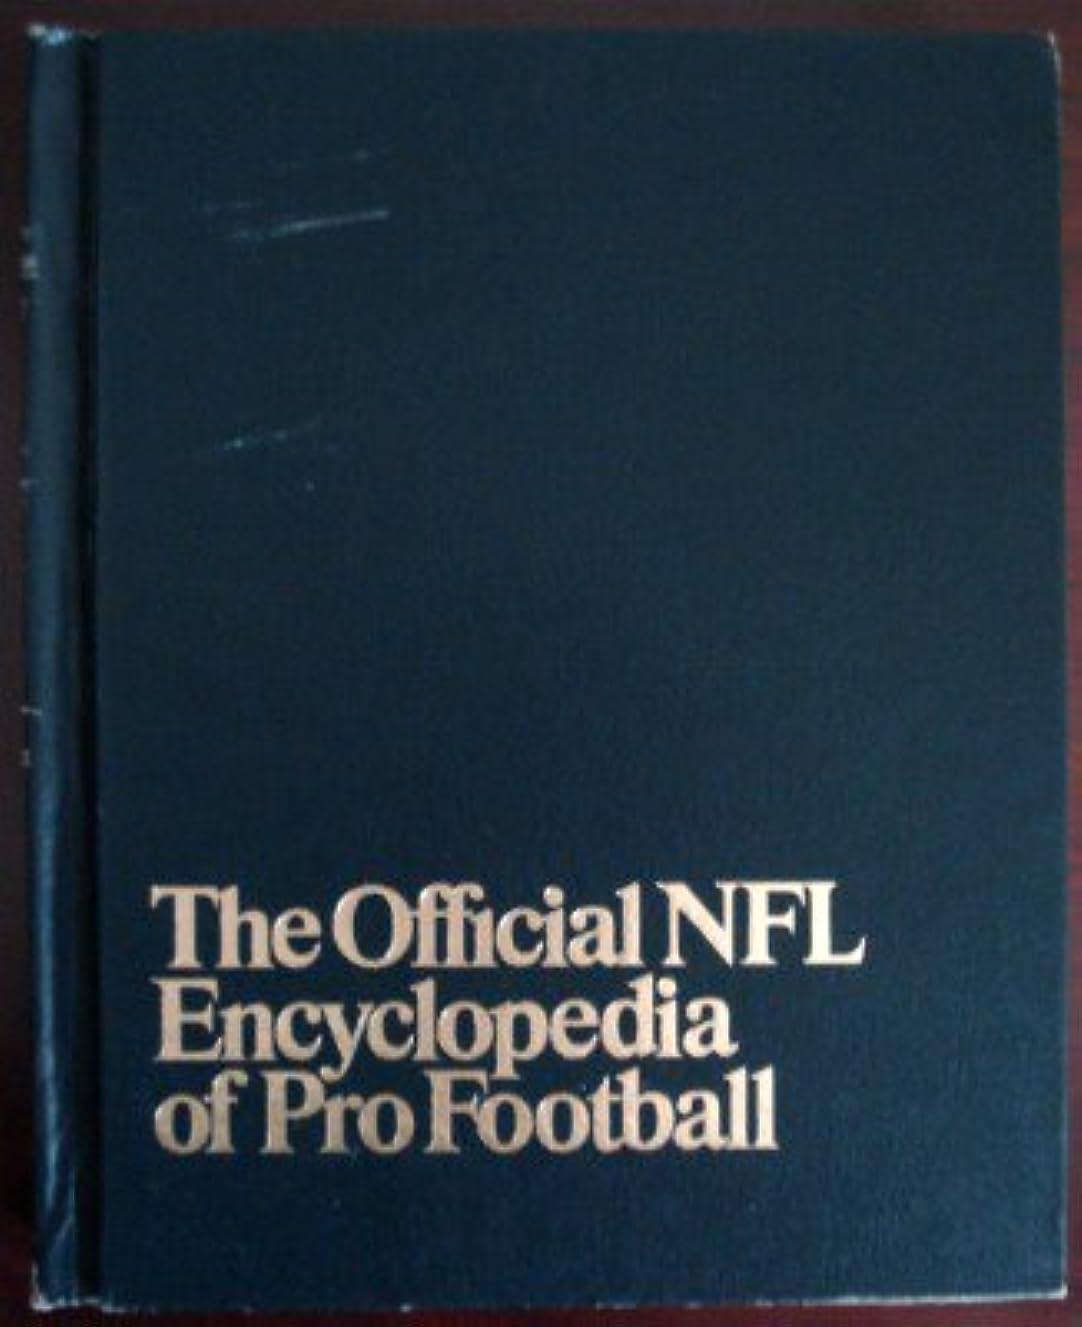 The NFL Encyclopedia